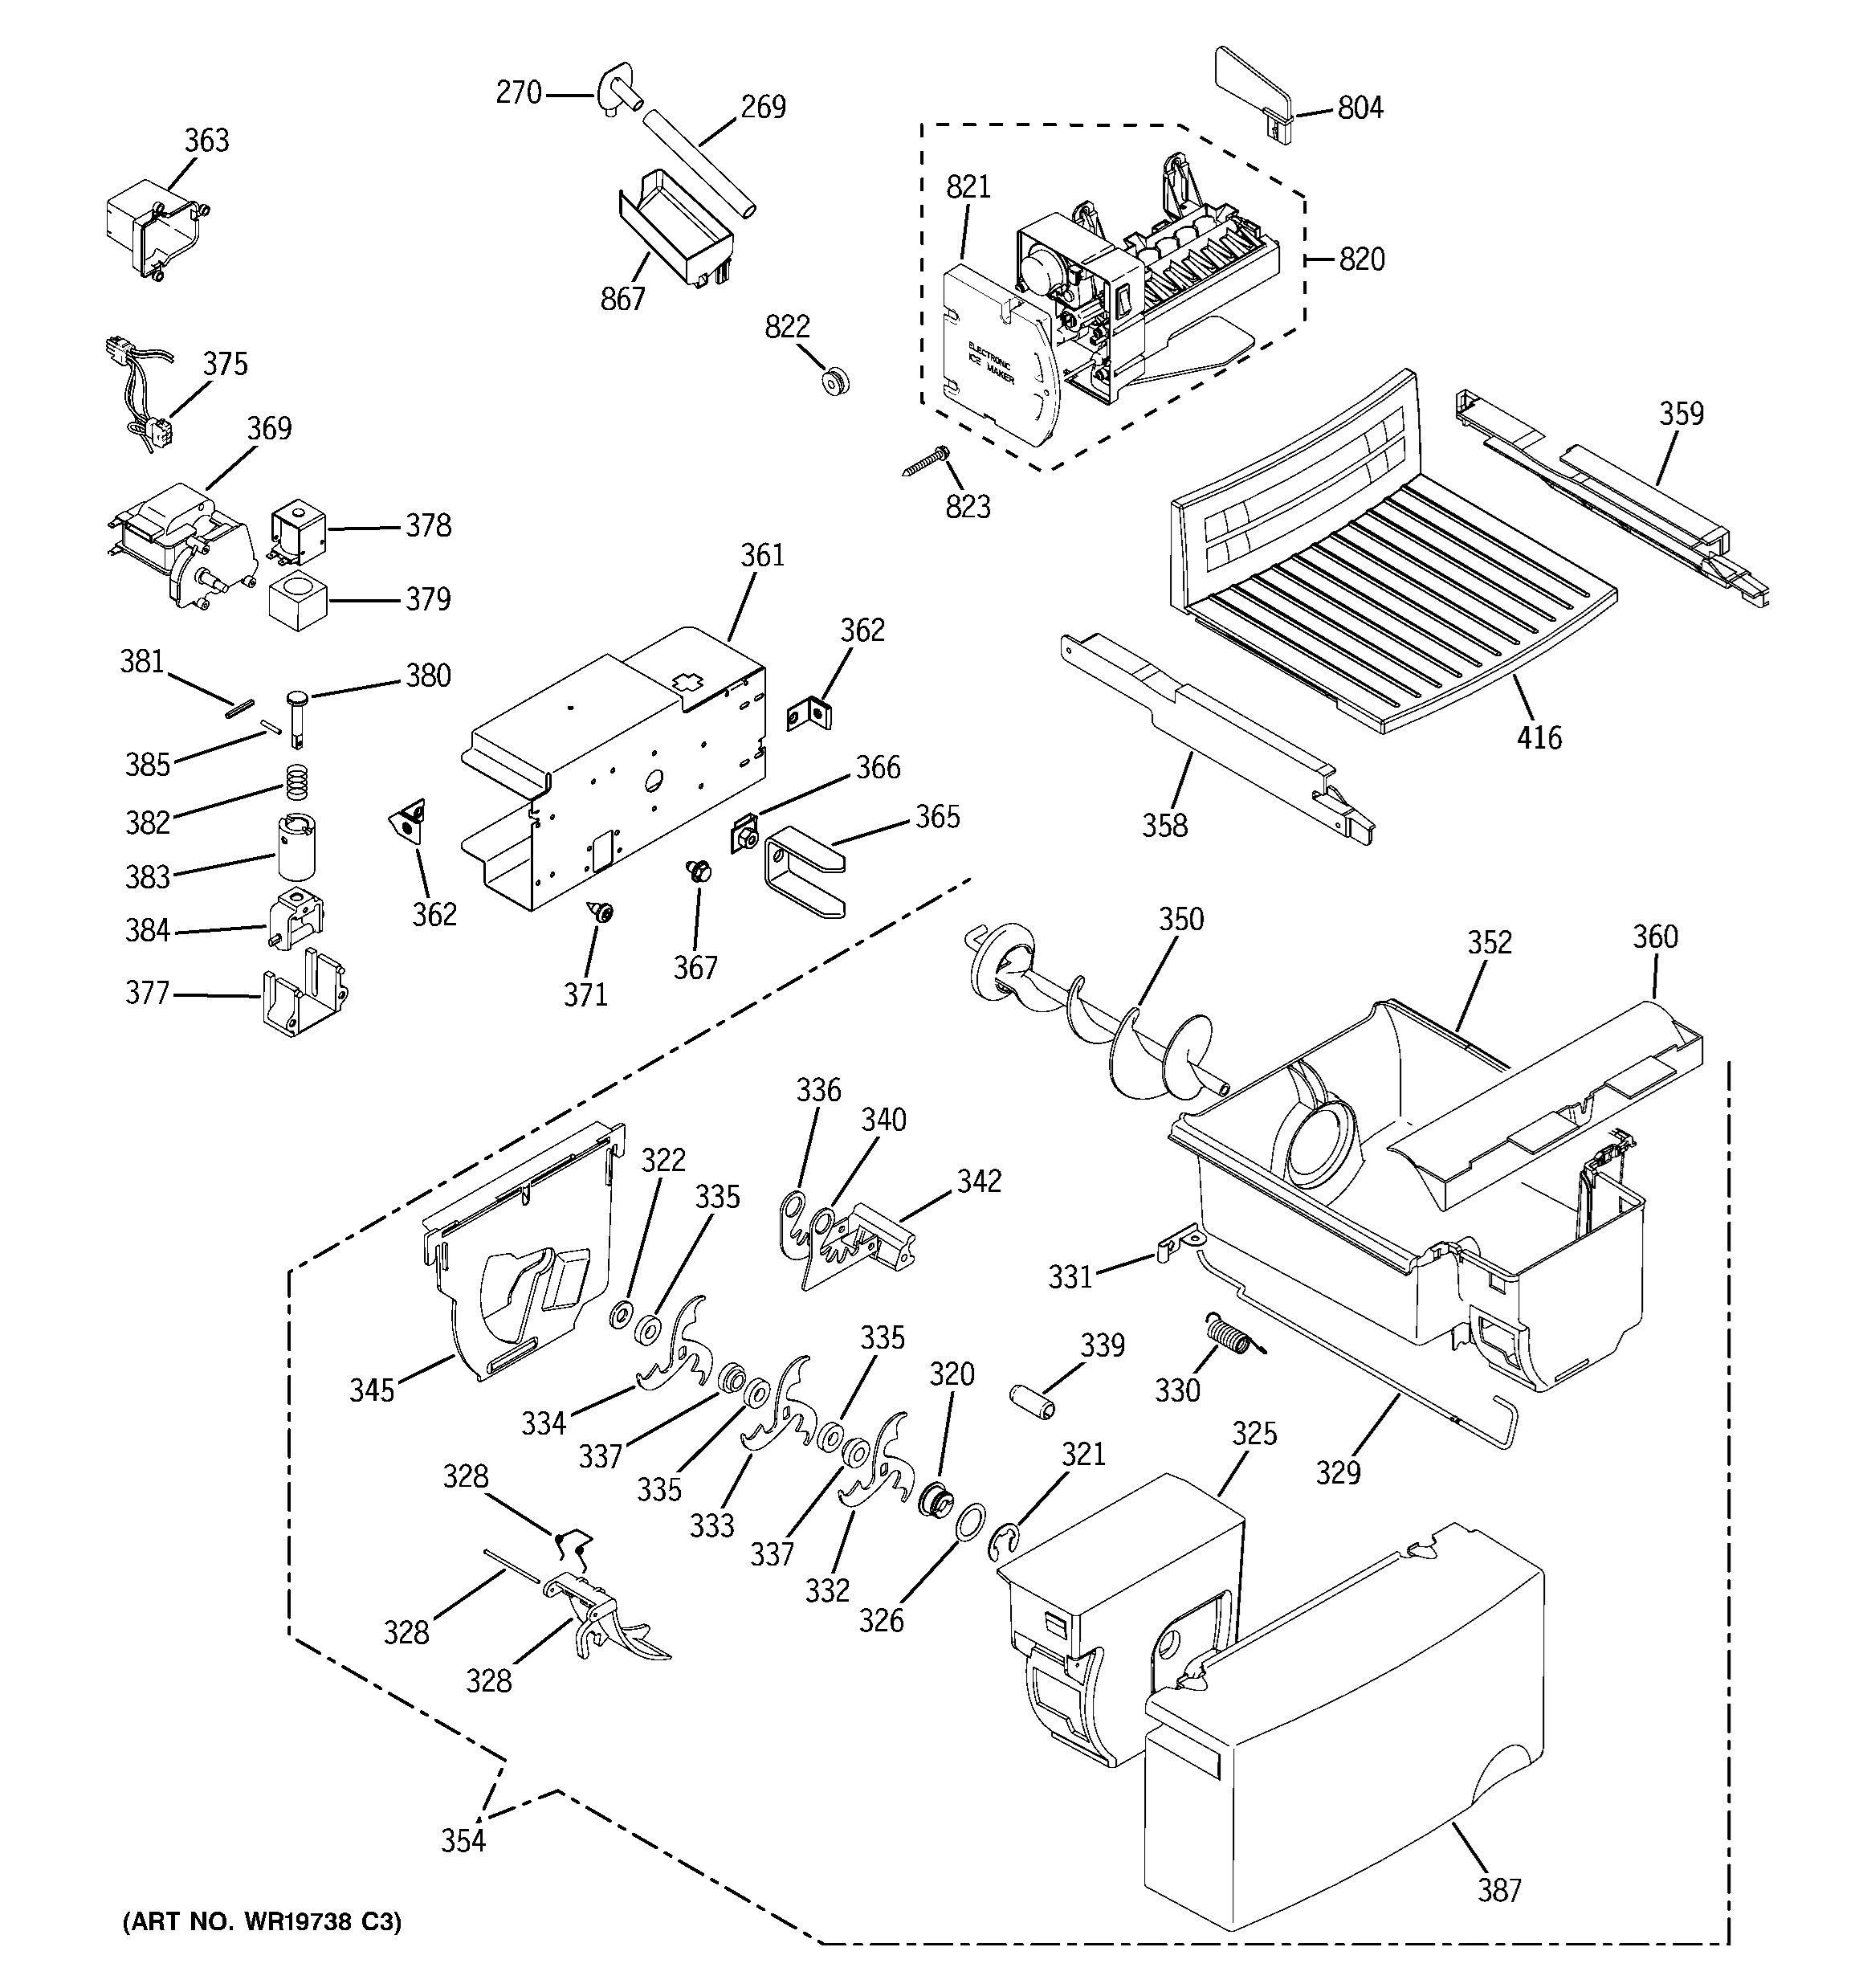 general electric refrigerator wiring diagrams building design, Wiring diagram